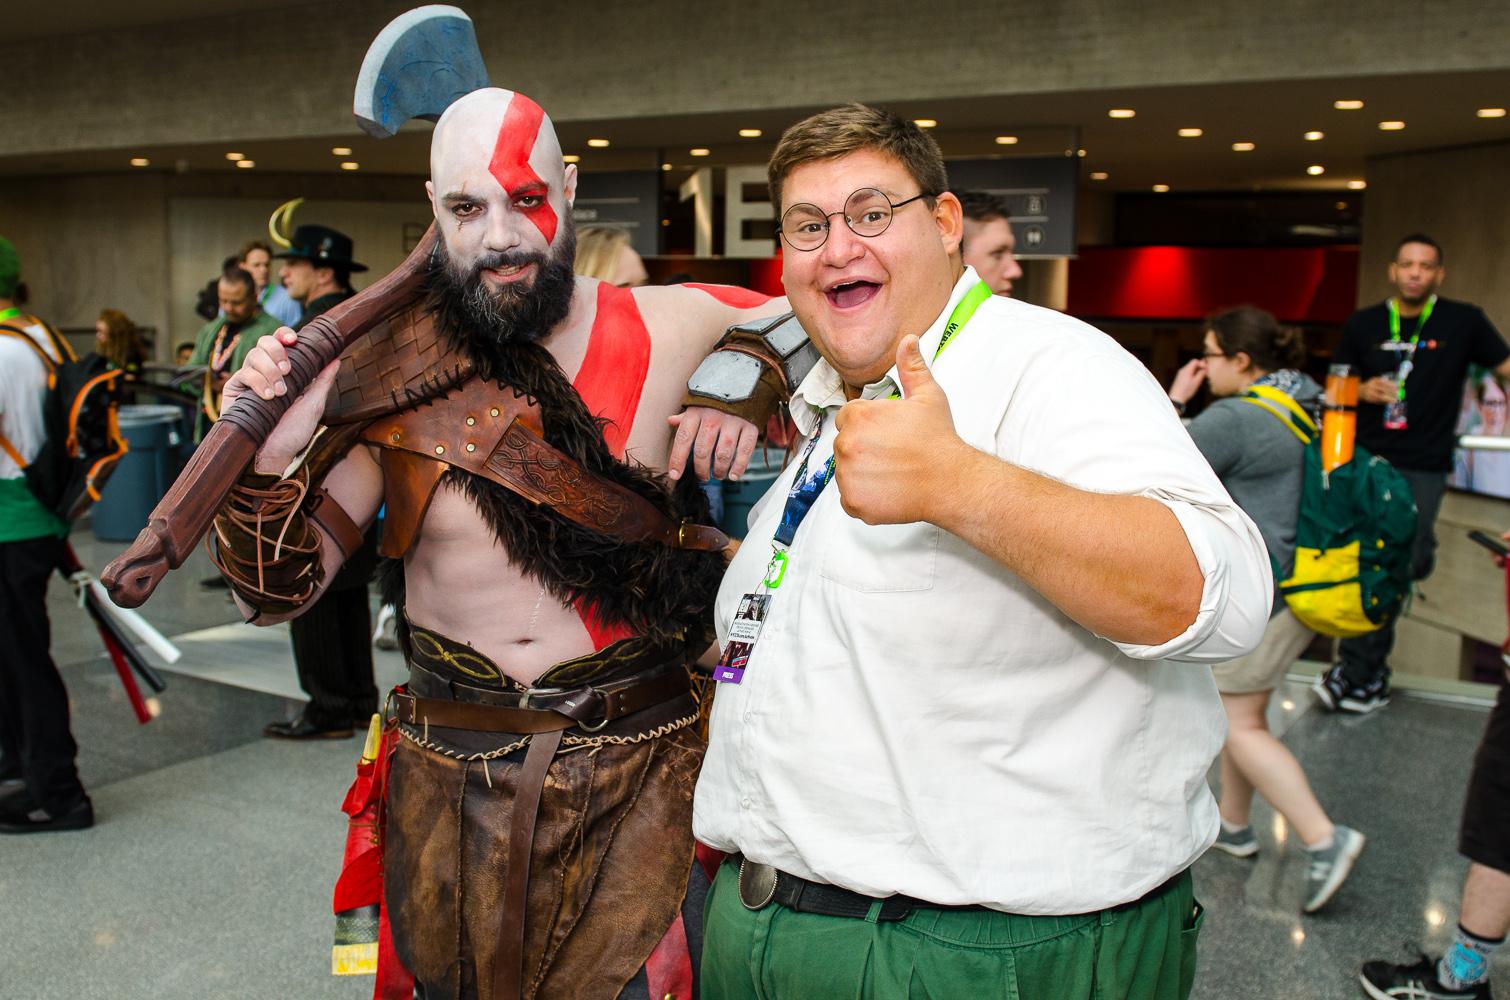 Kratos Peter Griffin New York Comic Con 2018 Ben Kaye-68